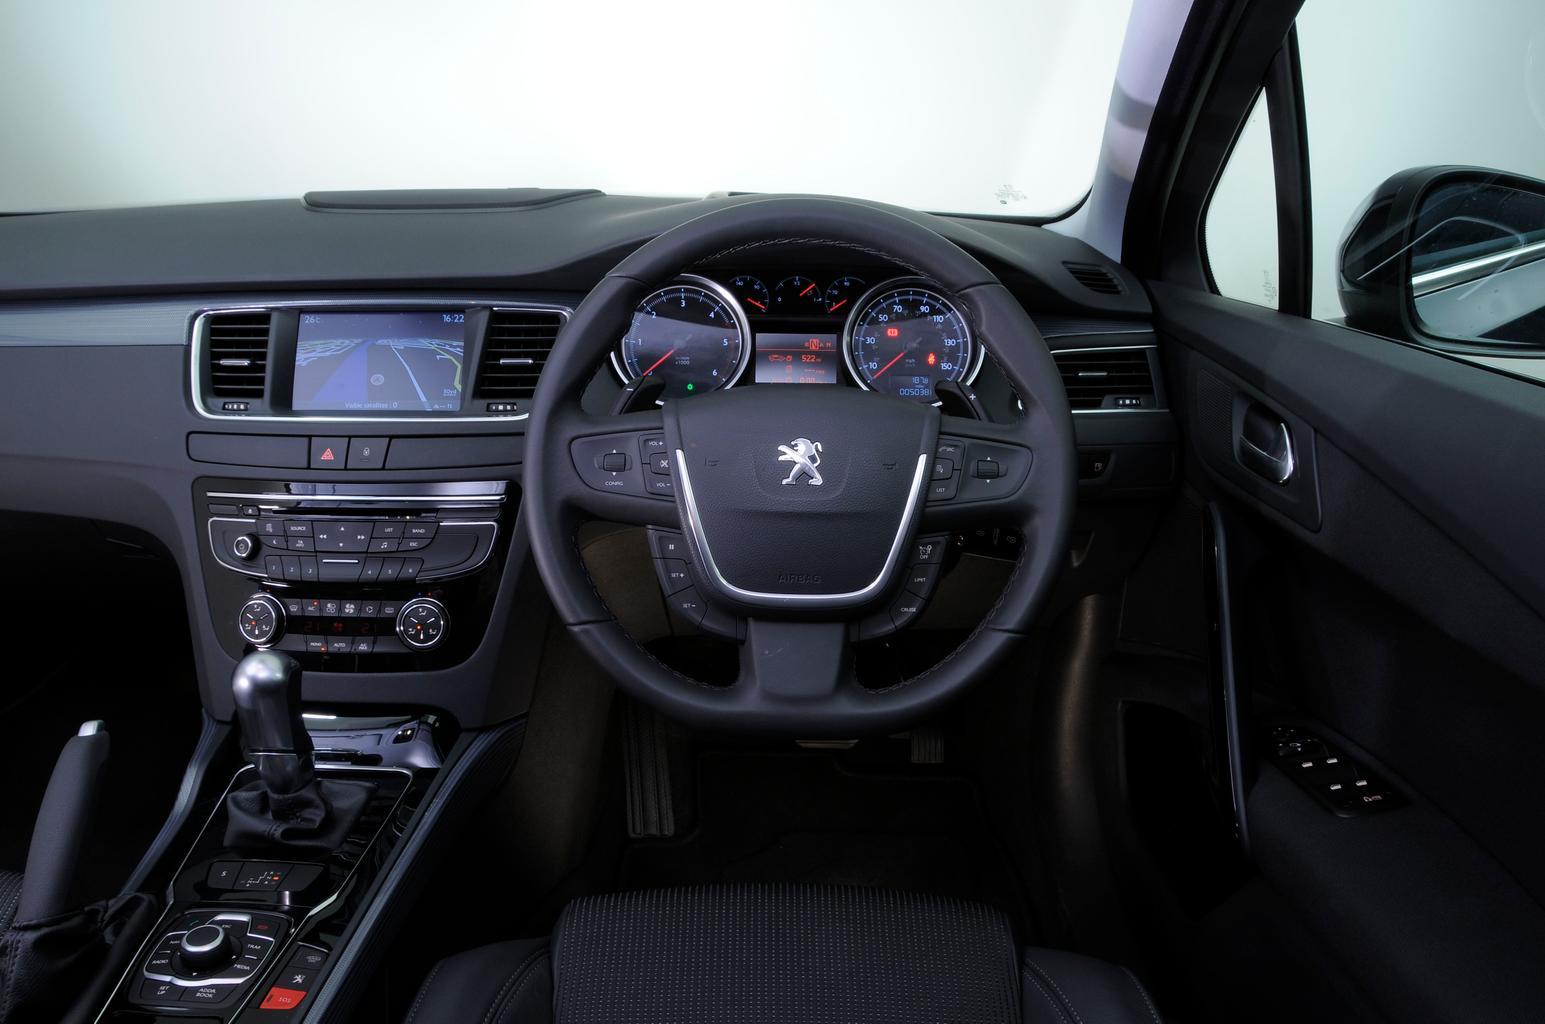 Used test – enormous estates: Ford Mondeo vs Skoda Superb vs Peugeot 508